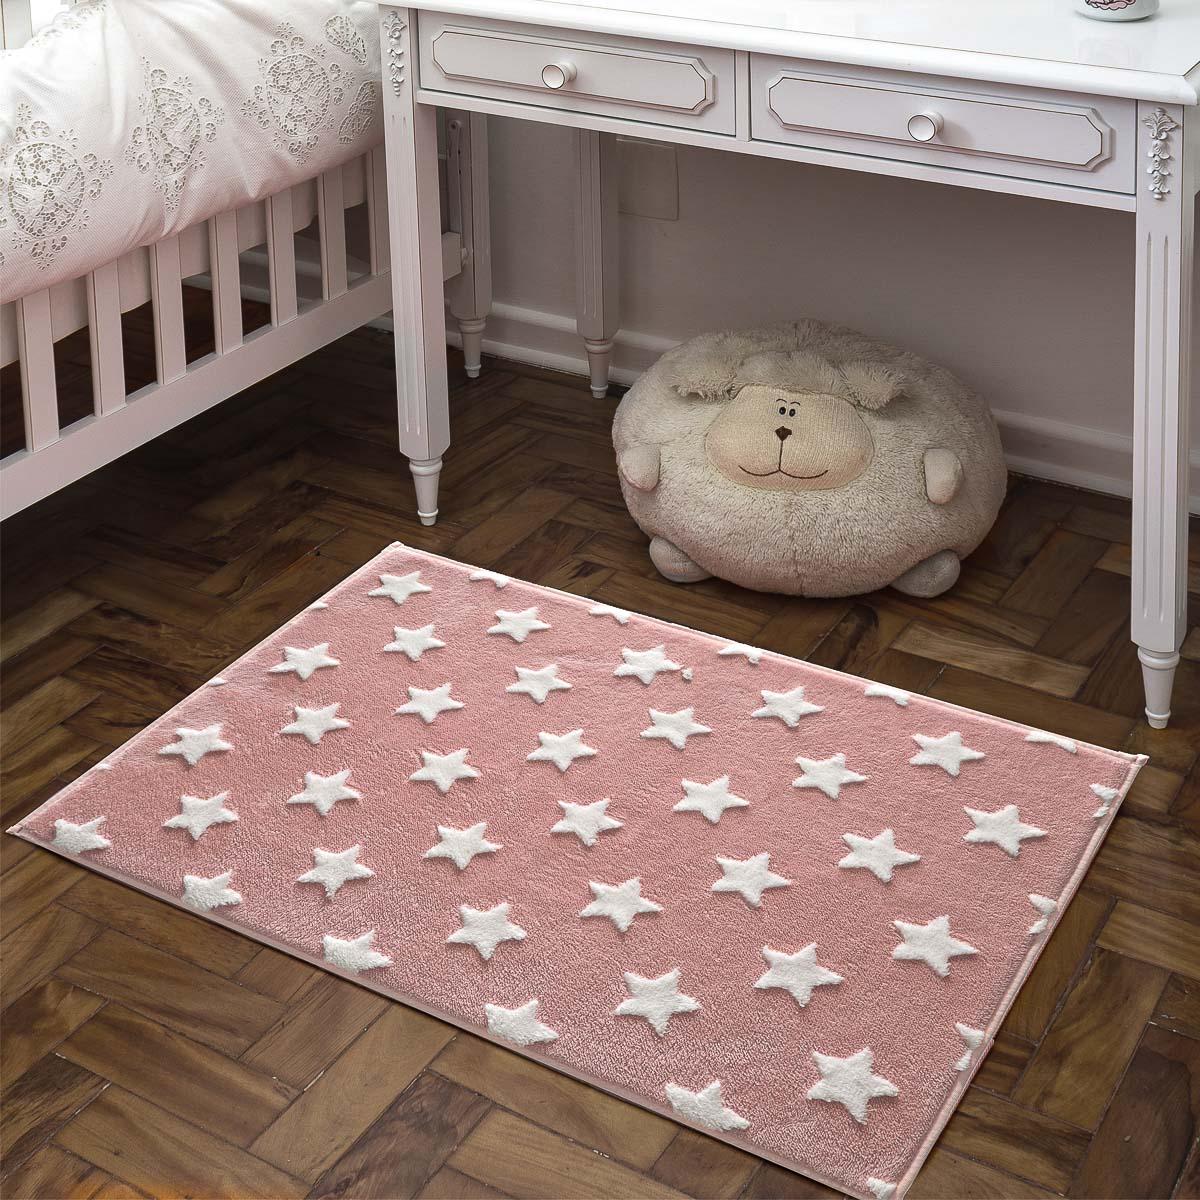 Tapete Infantil Quarto Bebe Menina Mimo 0,70x1m Estrela Rosa